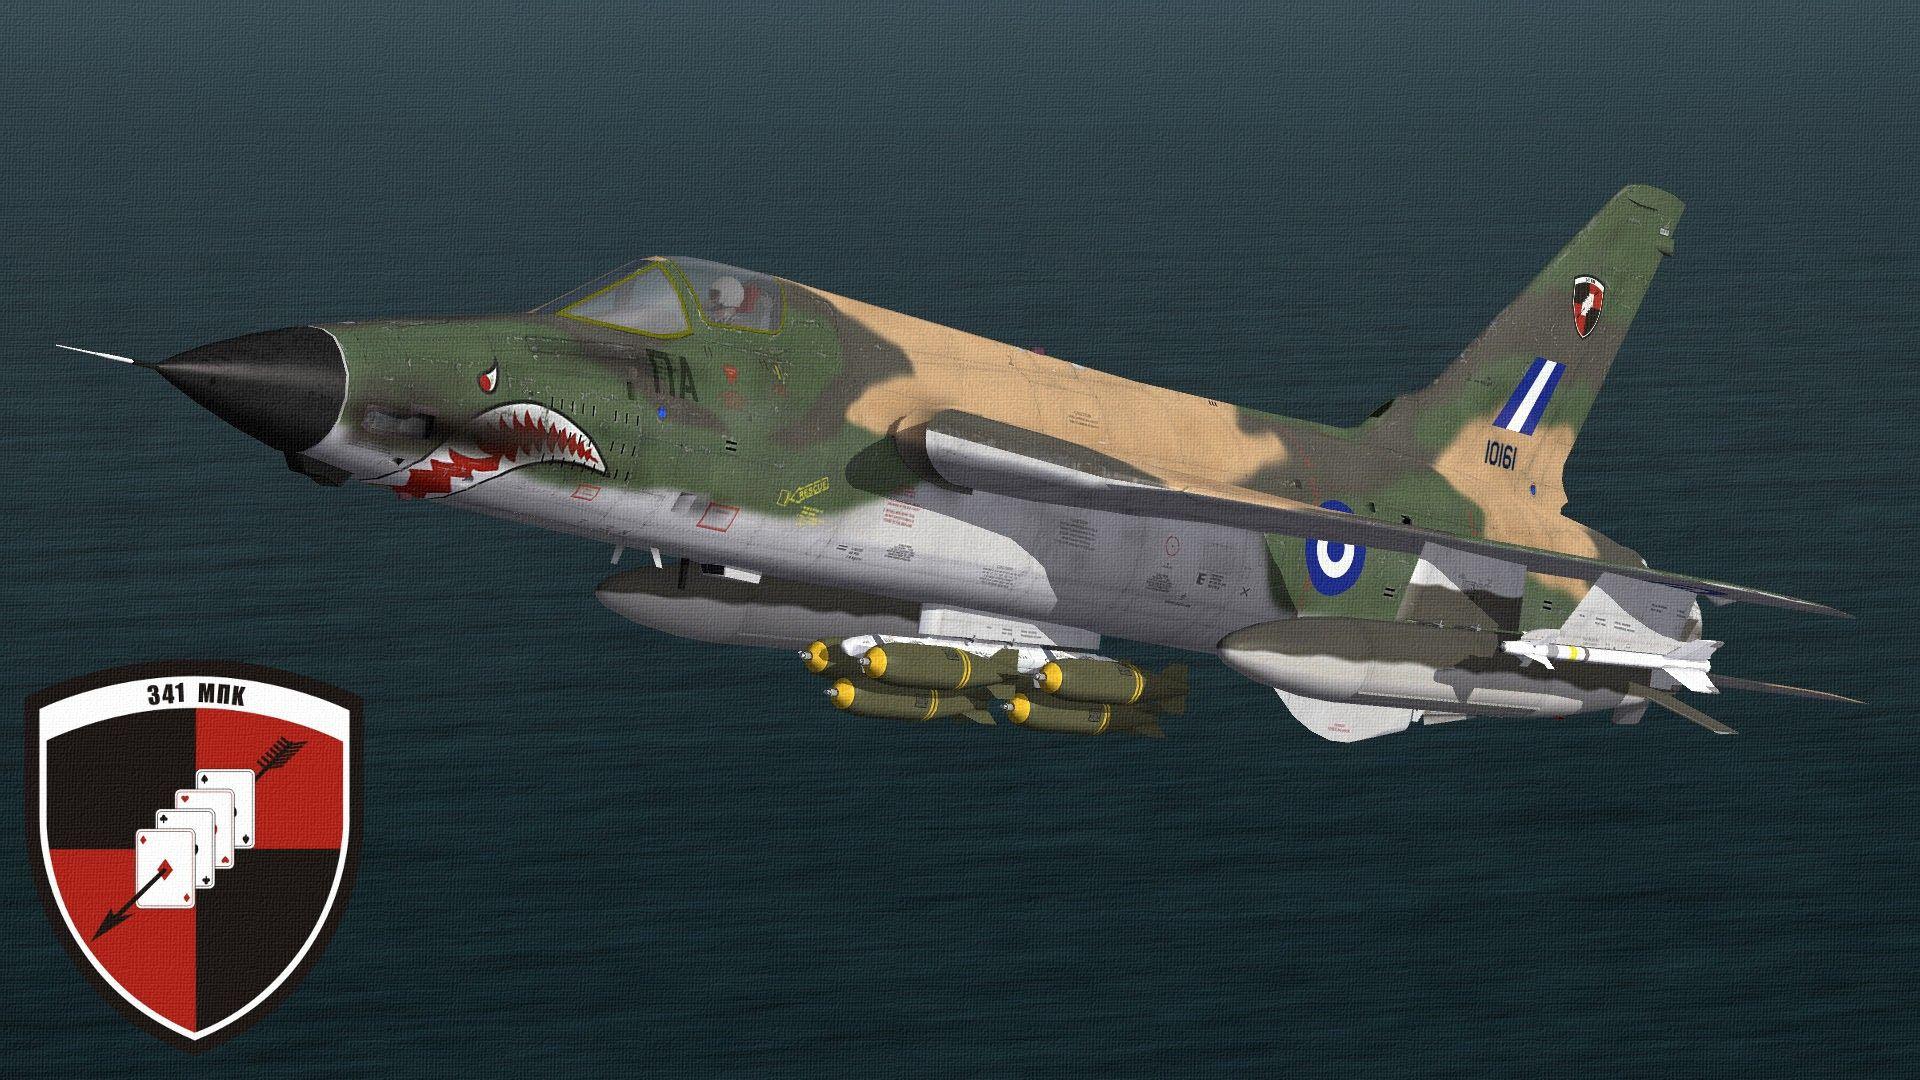 HAFF-105HTHUNDERCHIEF04_zpsfb89839e.jpg